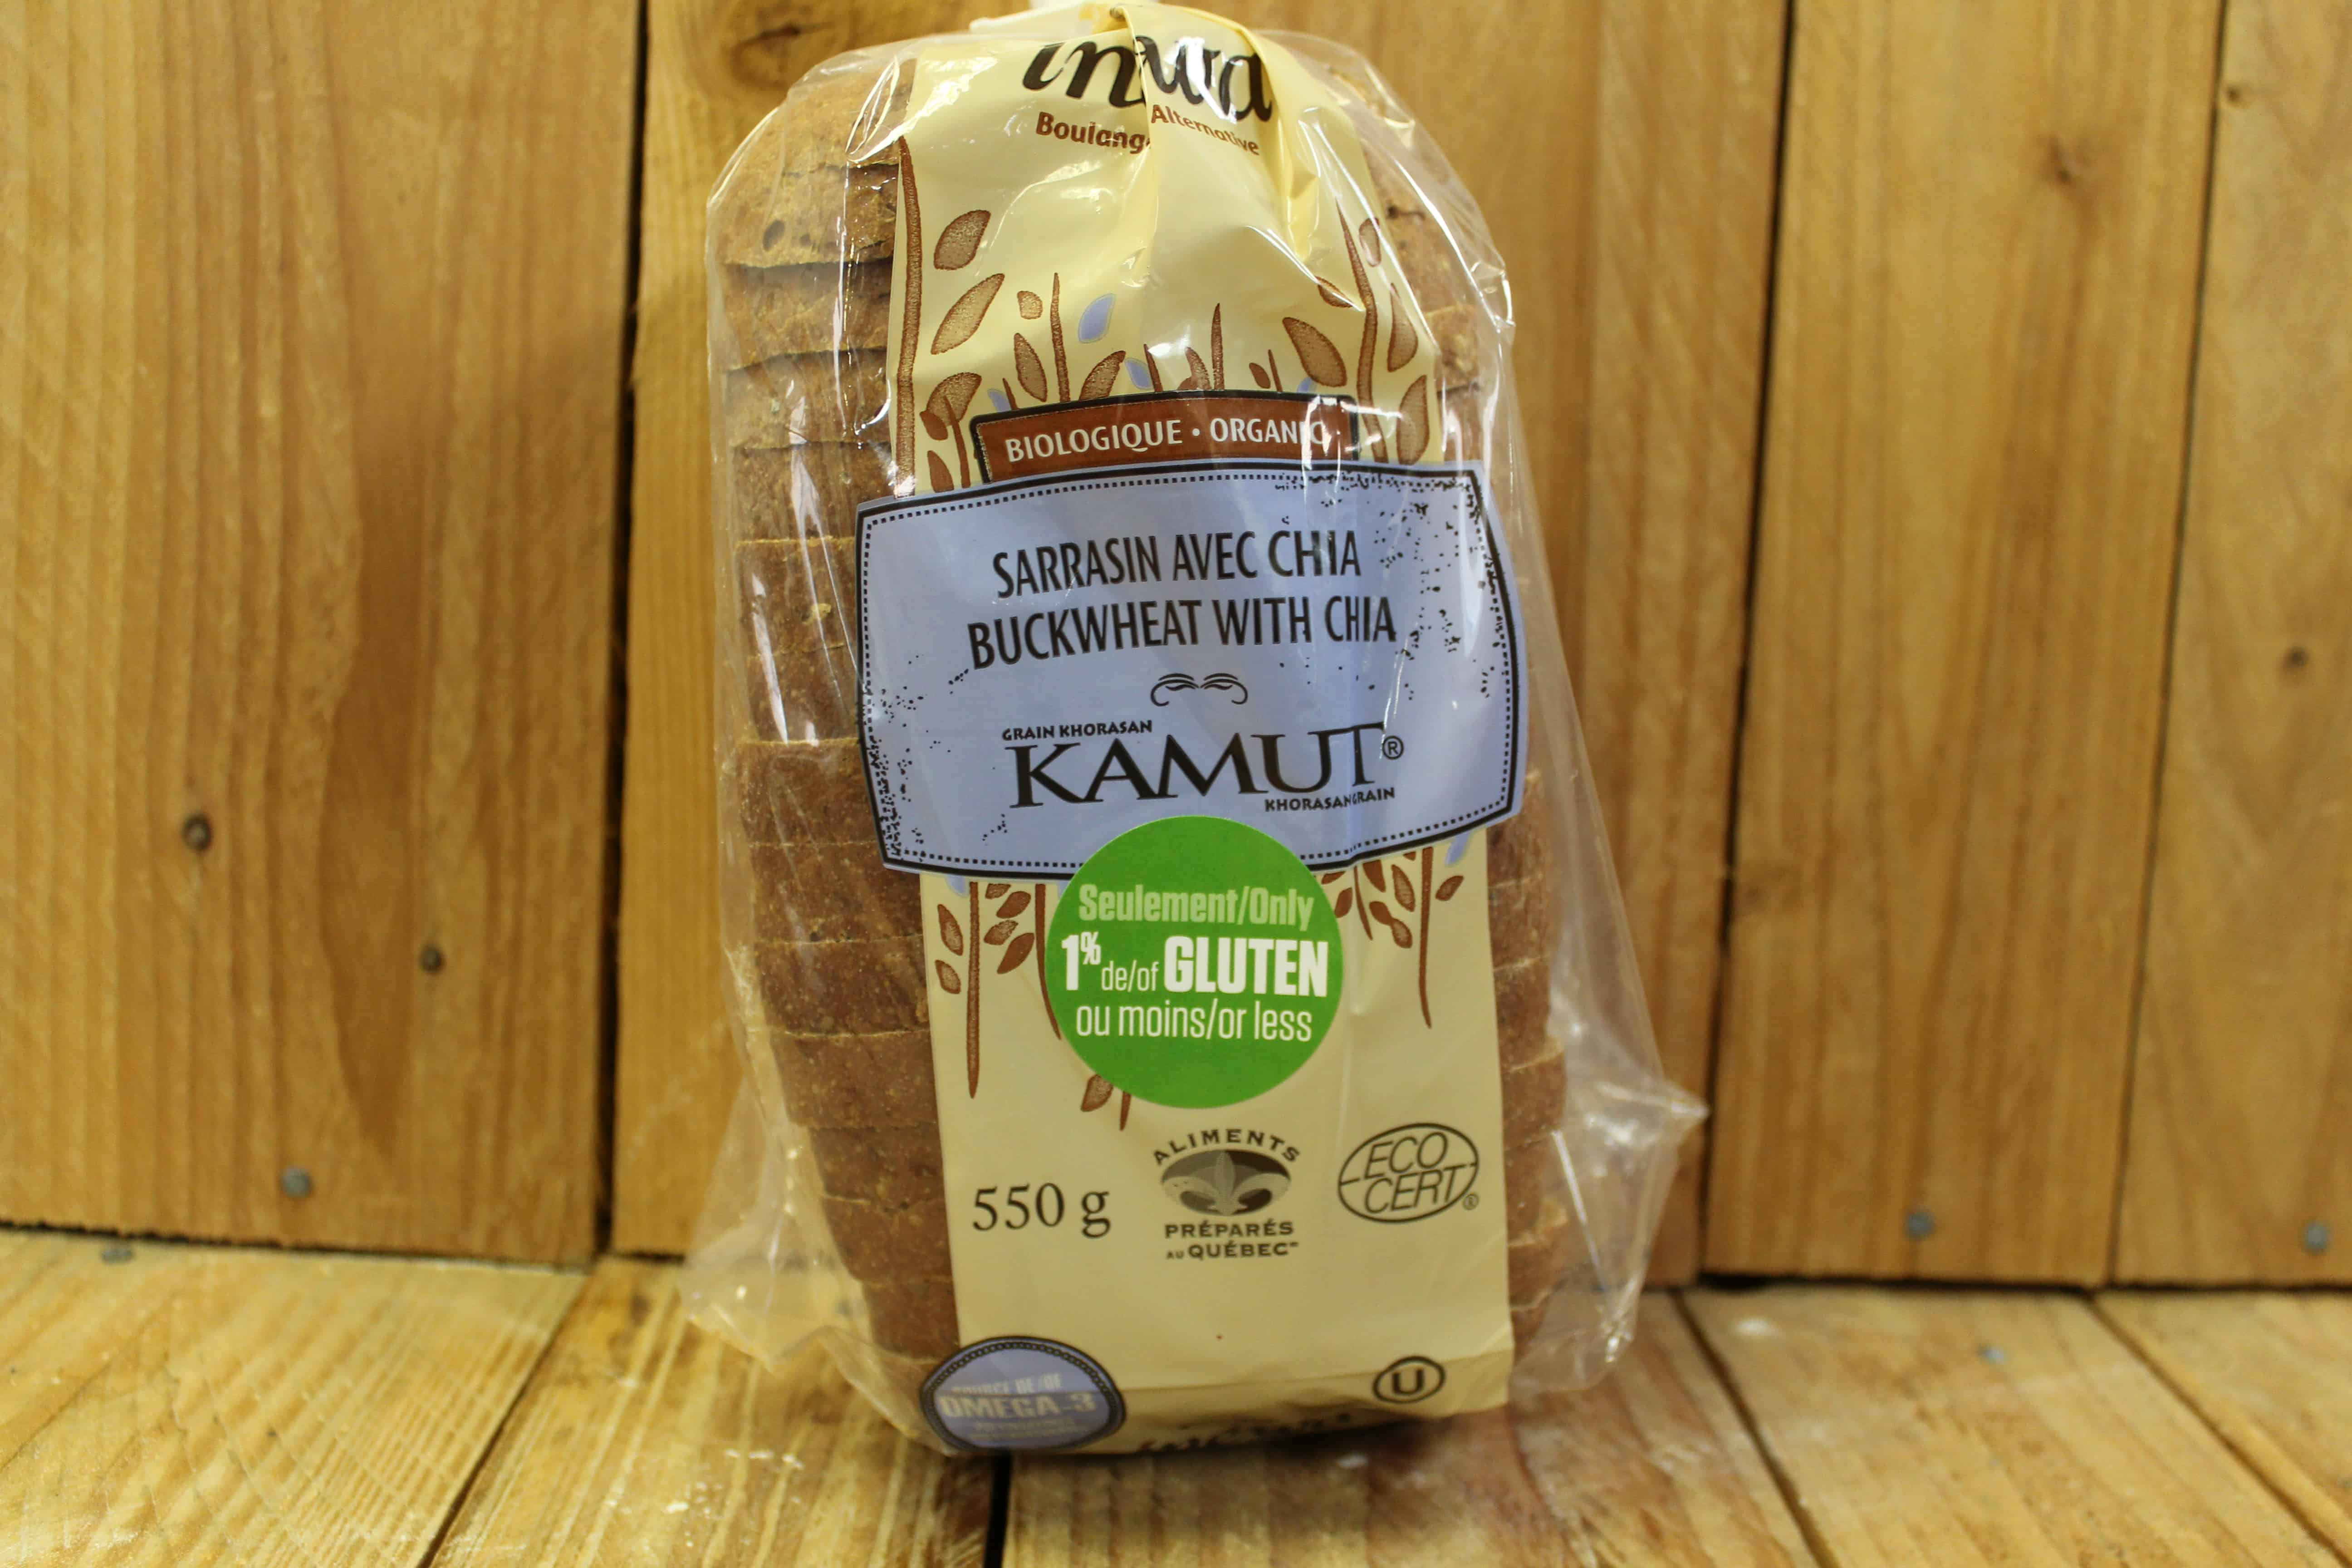 Inewa Bakery – Buckwheat and Chia Bread (low gluten) (Each)